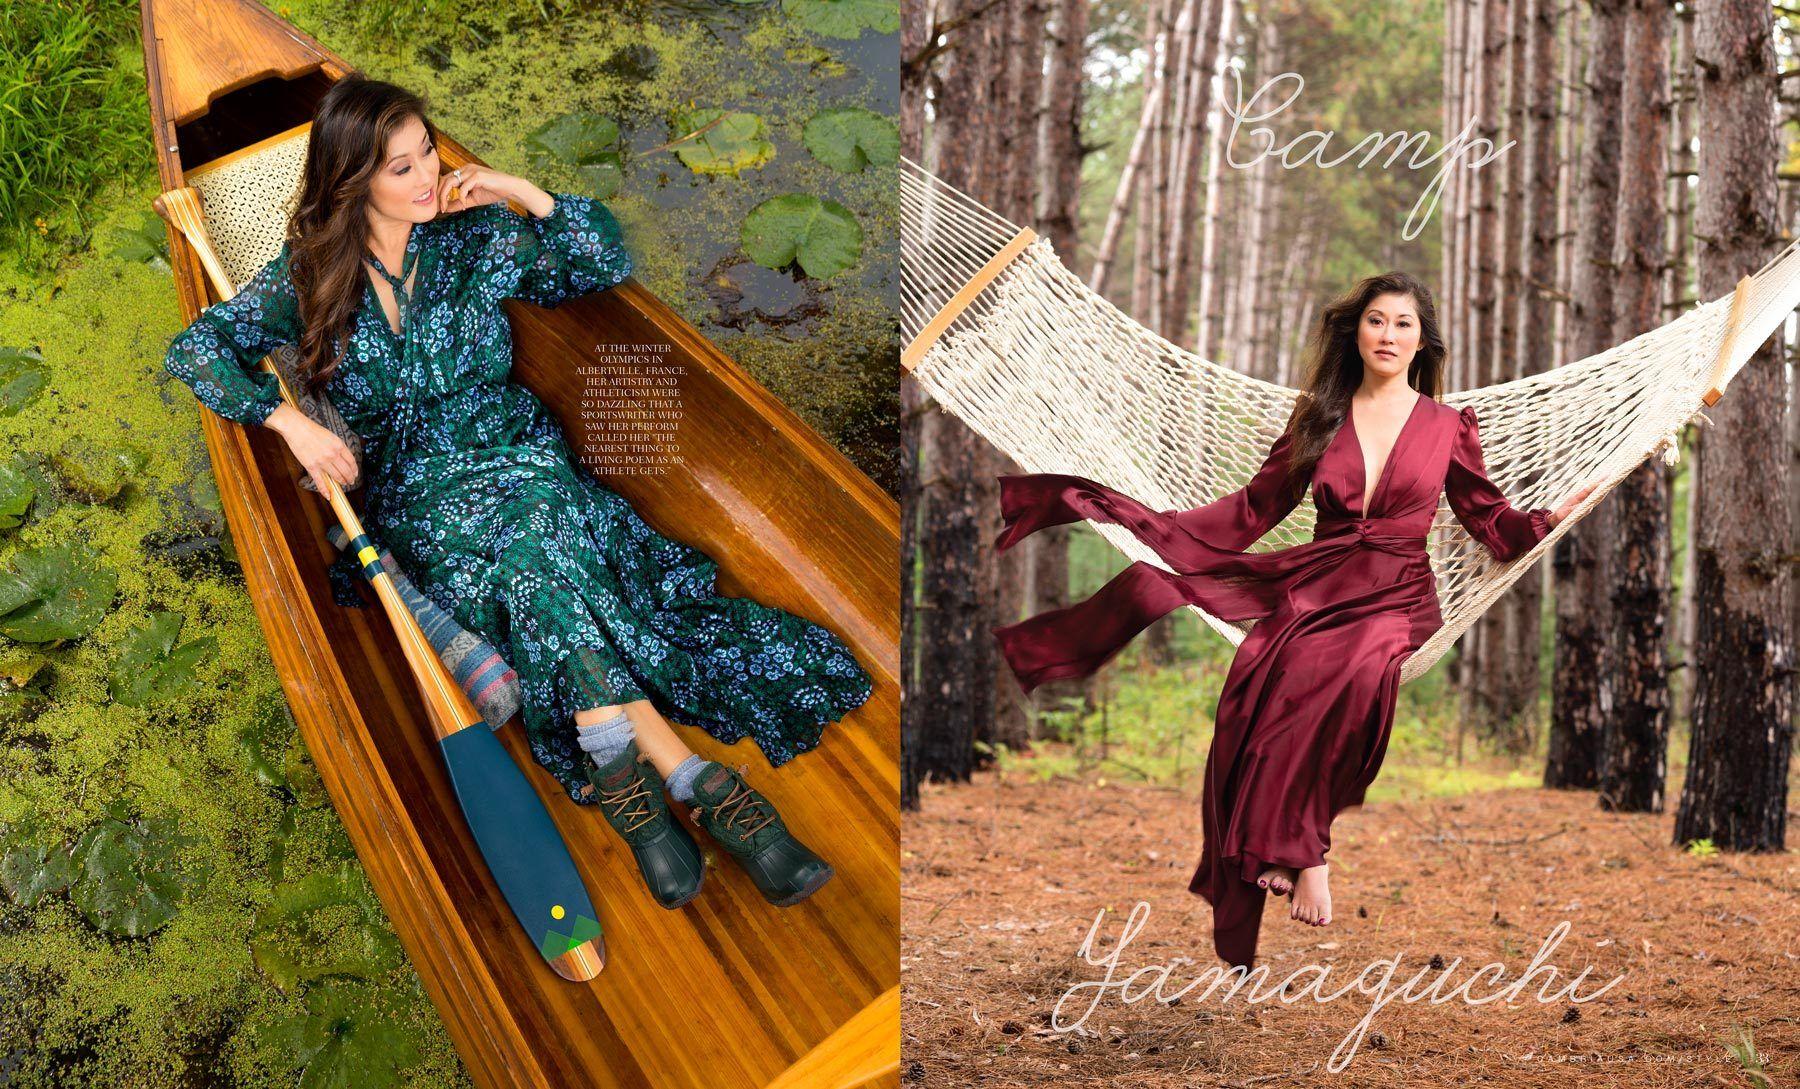 1kristi_yamaguchi_canoe_pine_forest_hammock.jpg